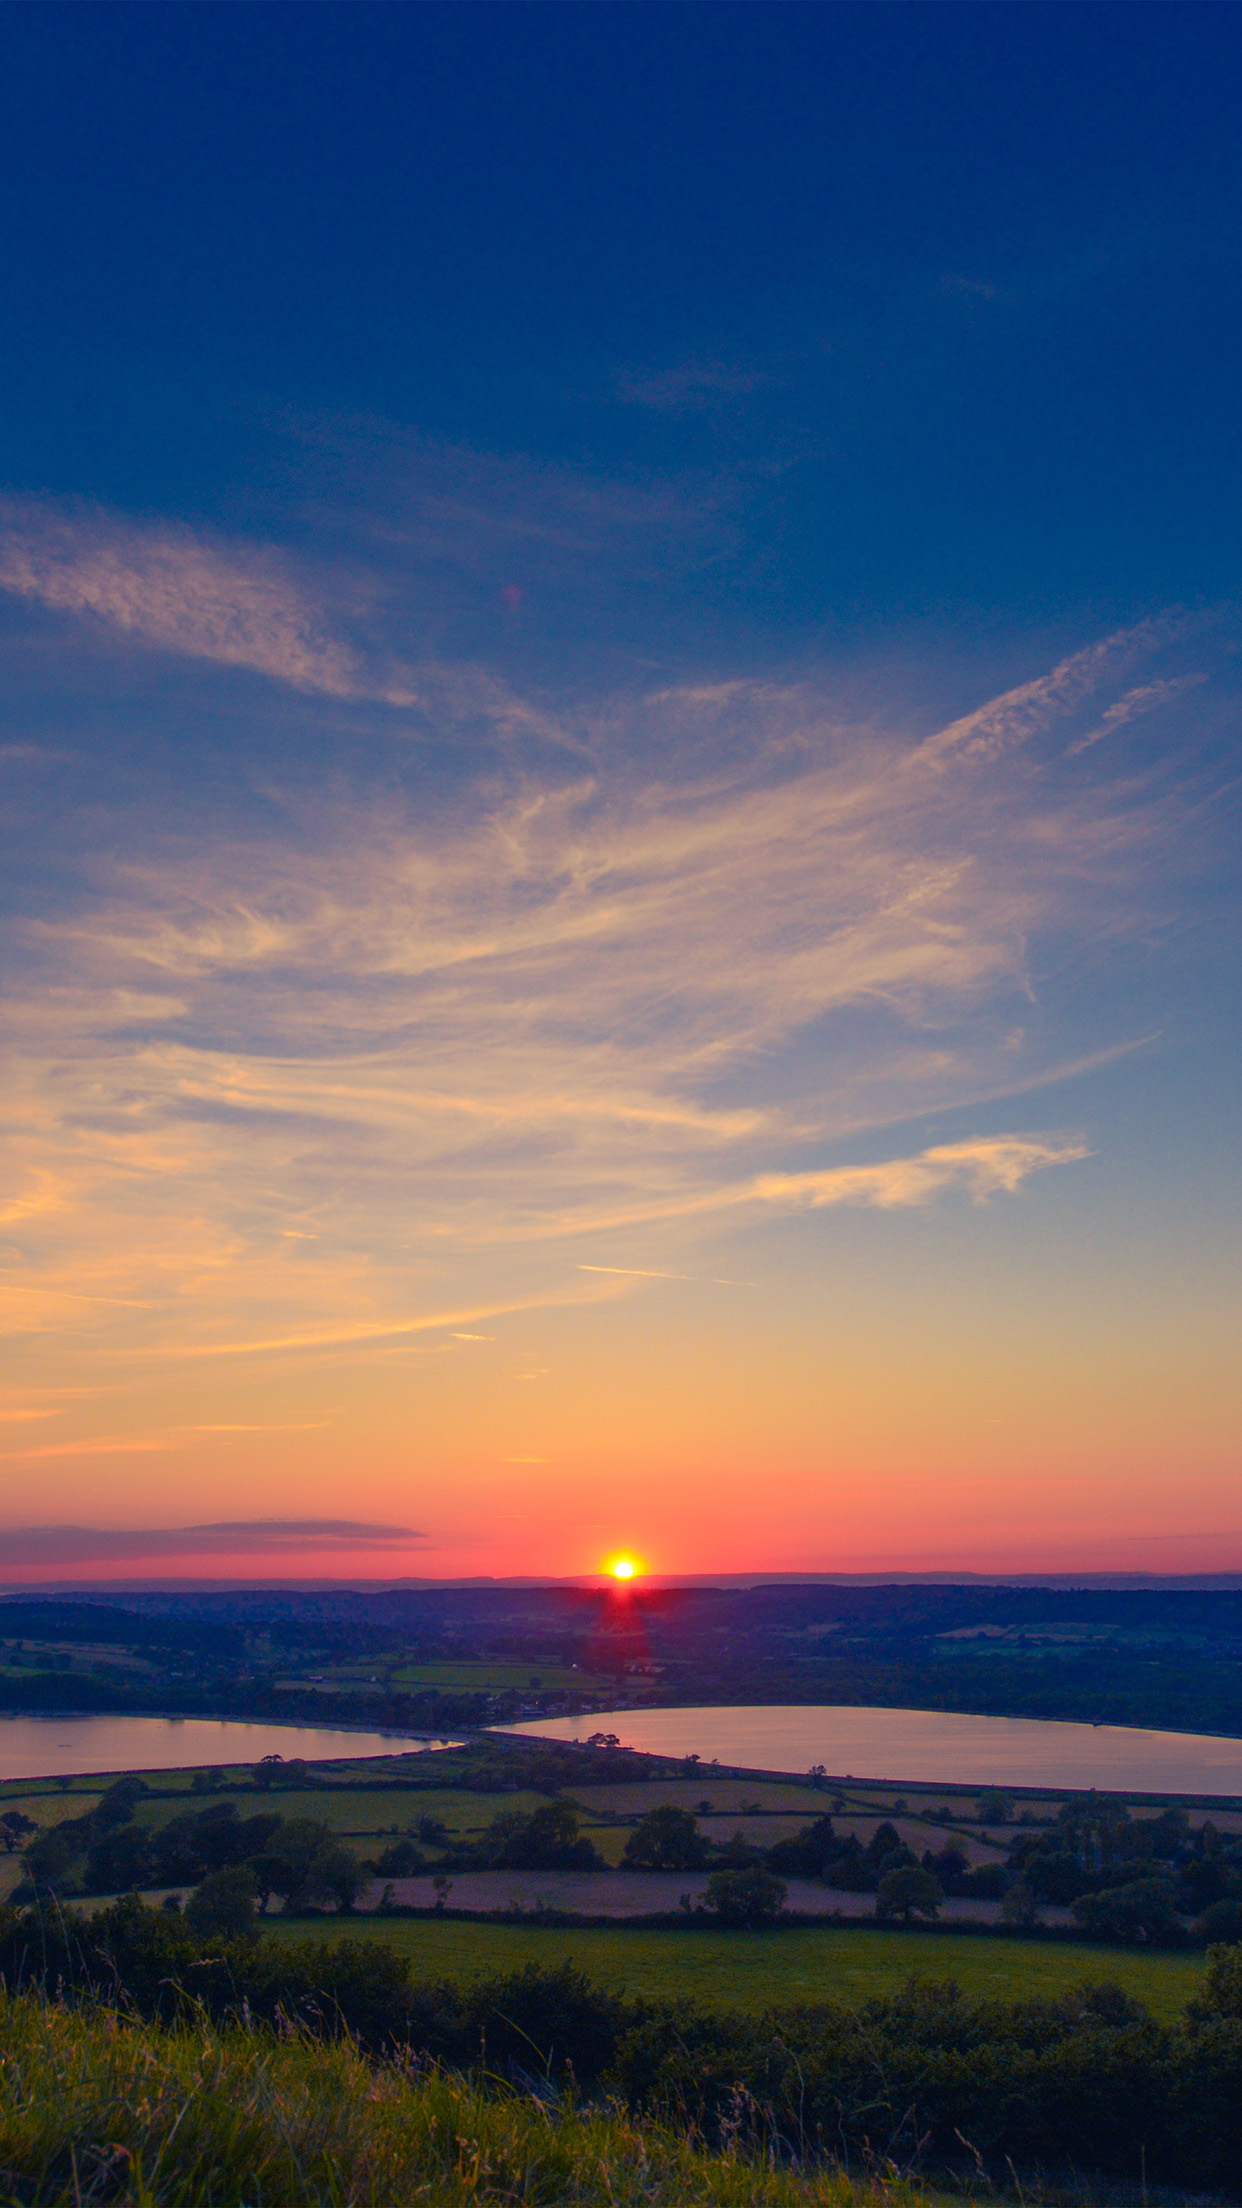 ni14-sunset-peace-land-sky-blue-nature-wallpaper